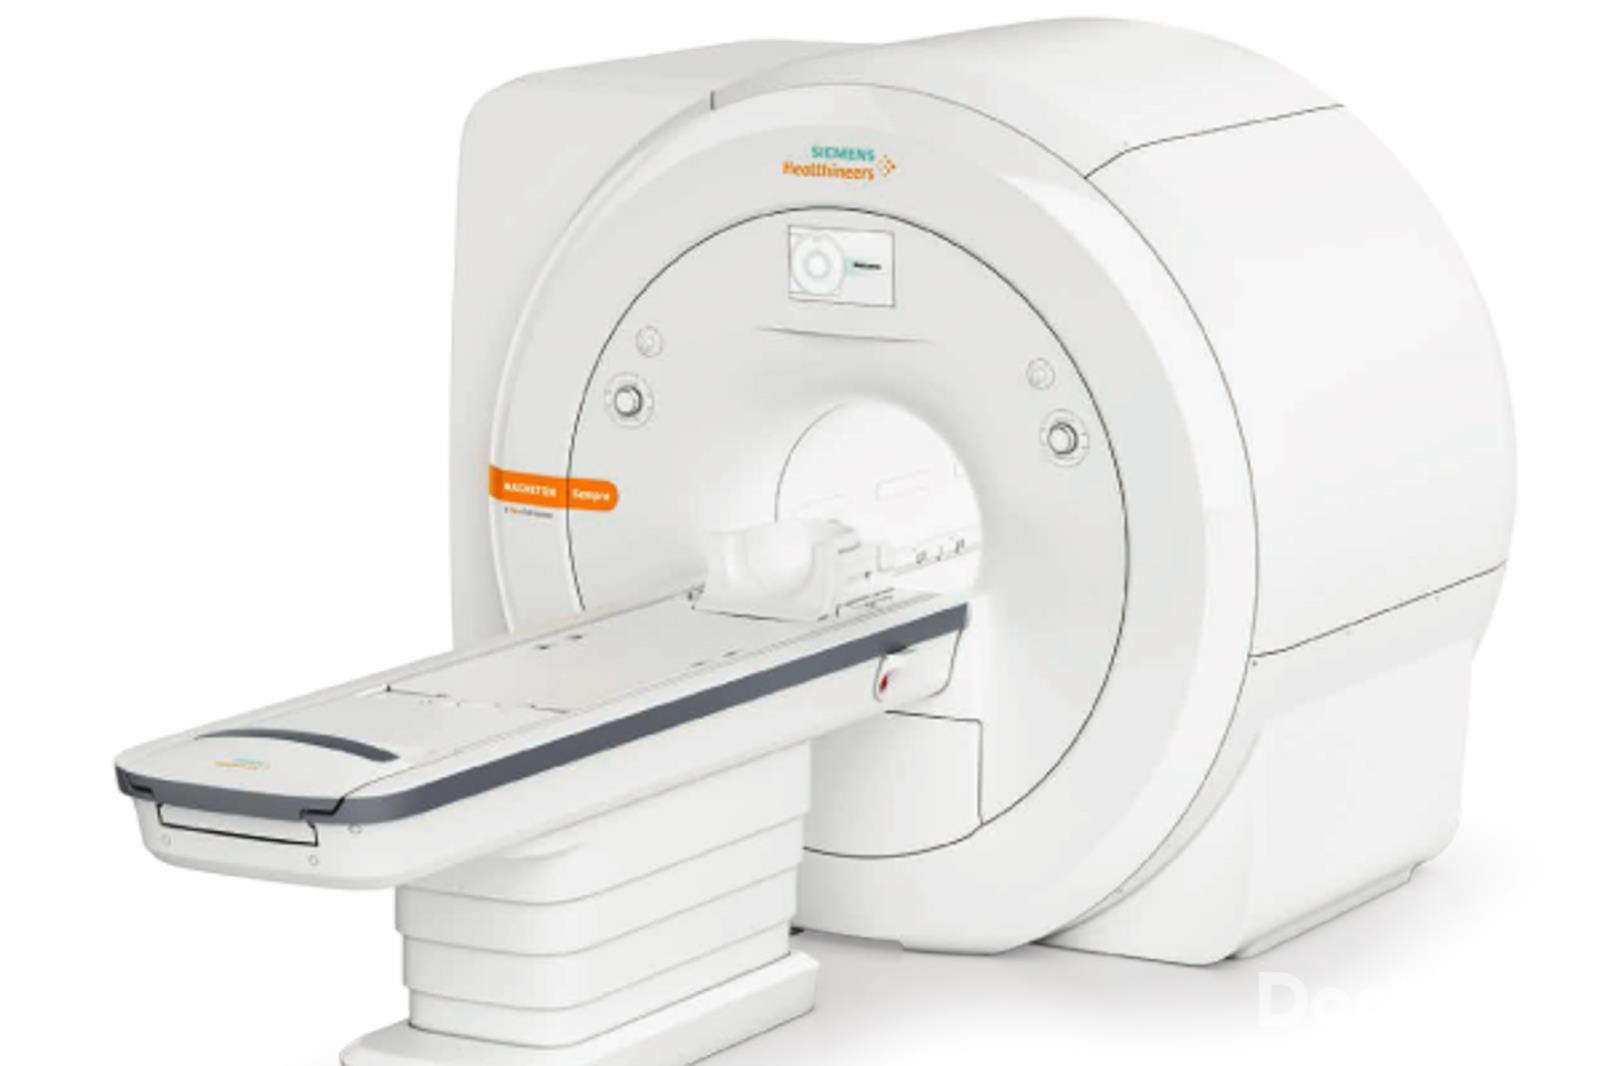 RMN (Rezonanta Magnetica)